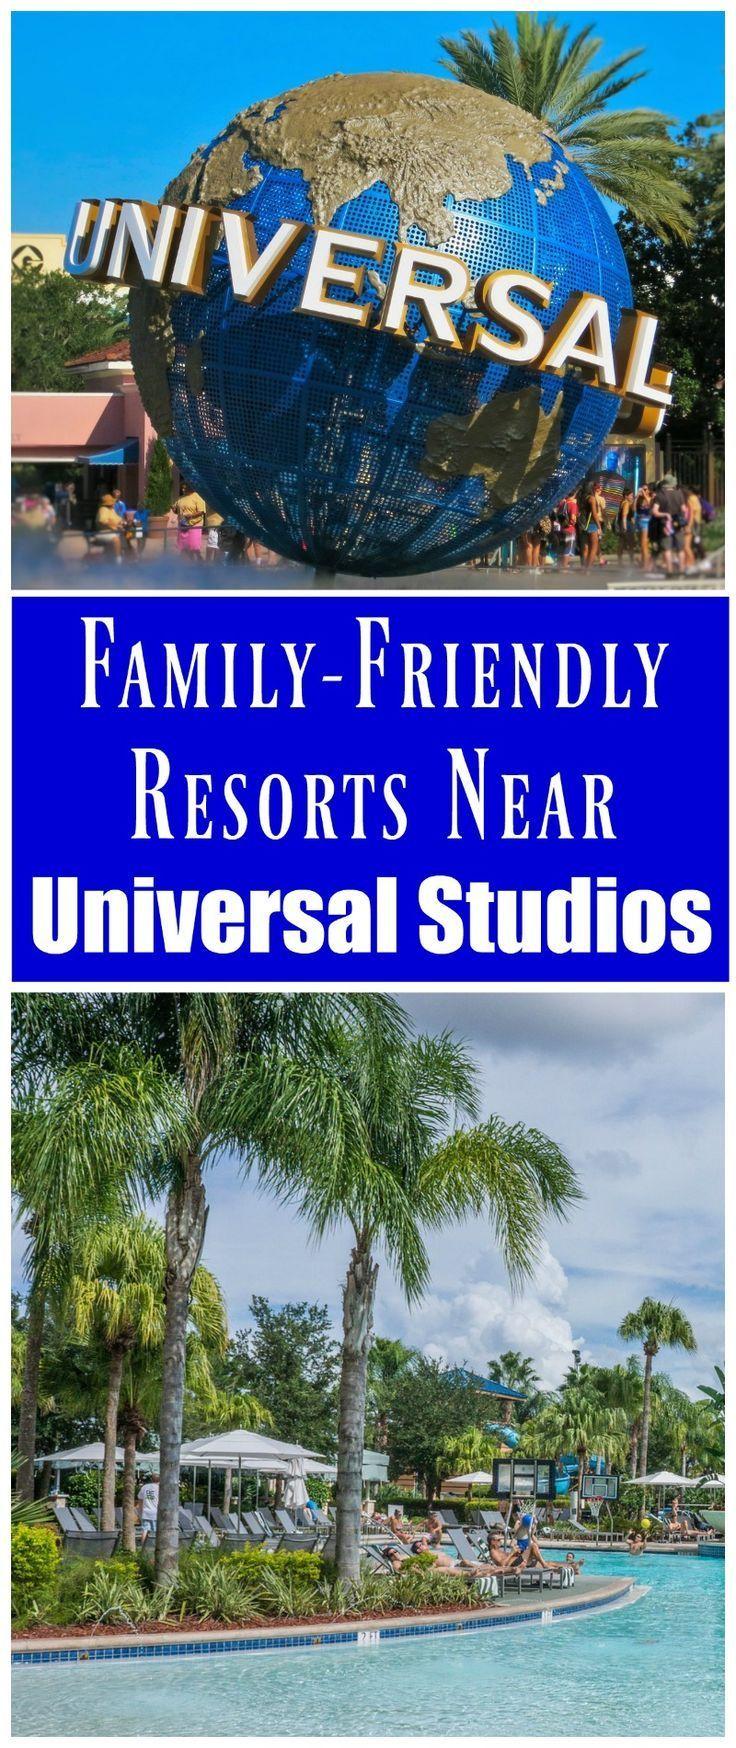 Disney Vacation Club - Wikipedia